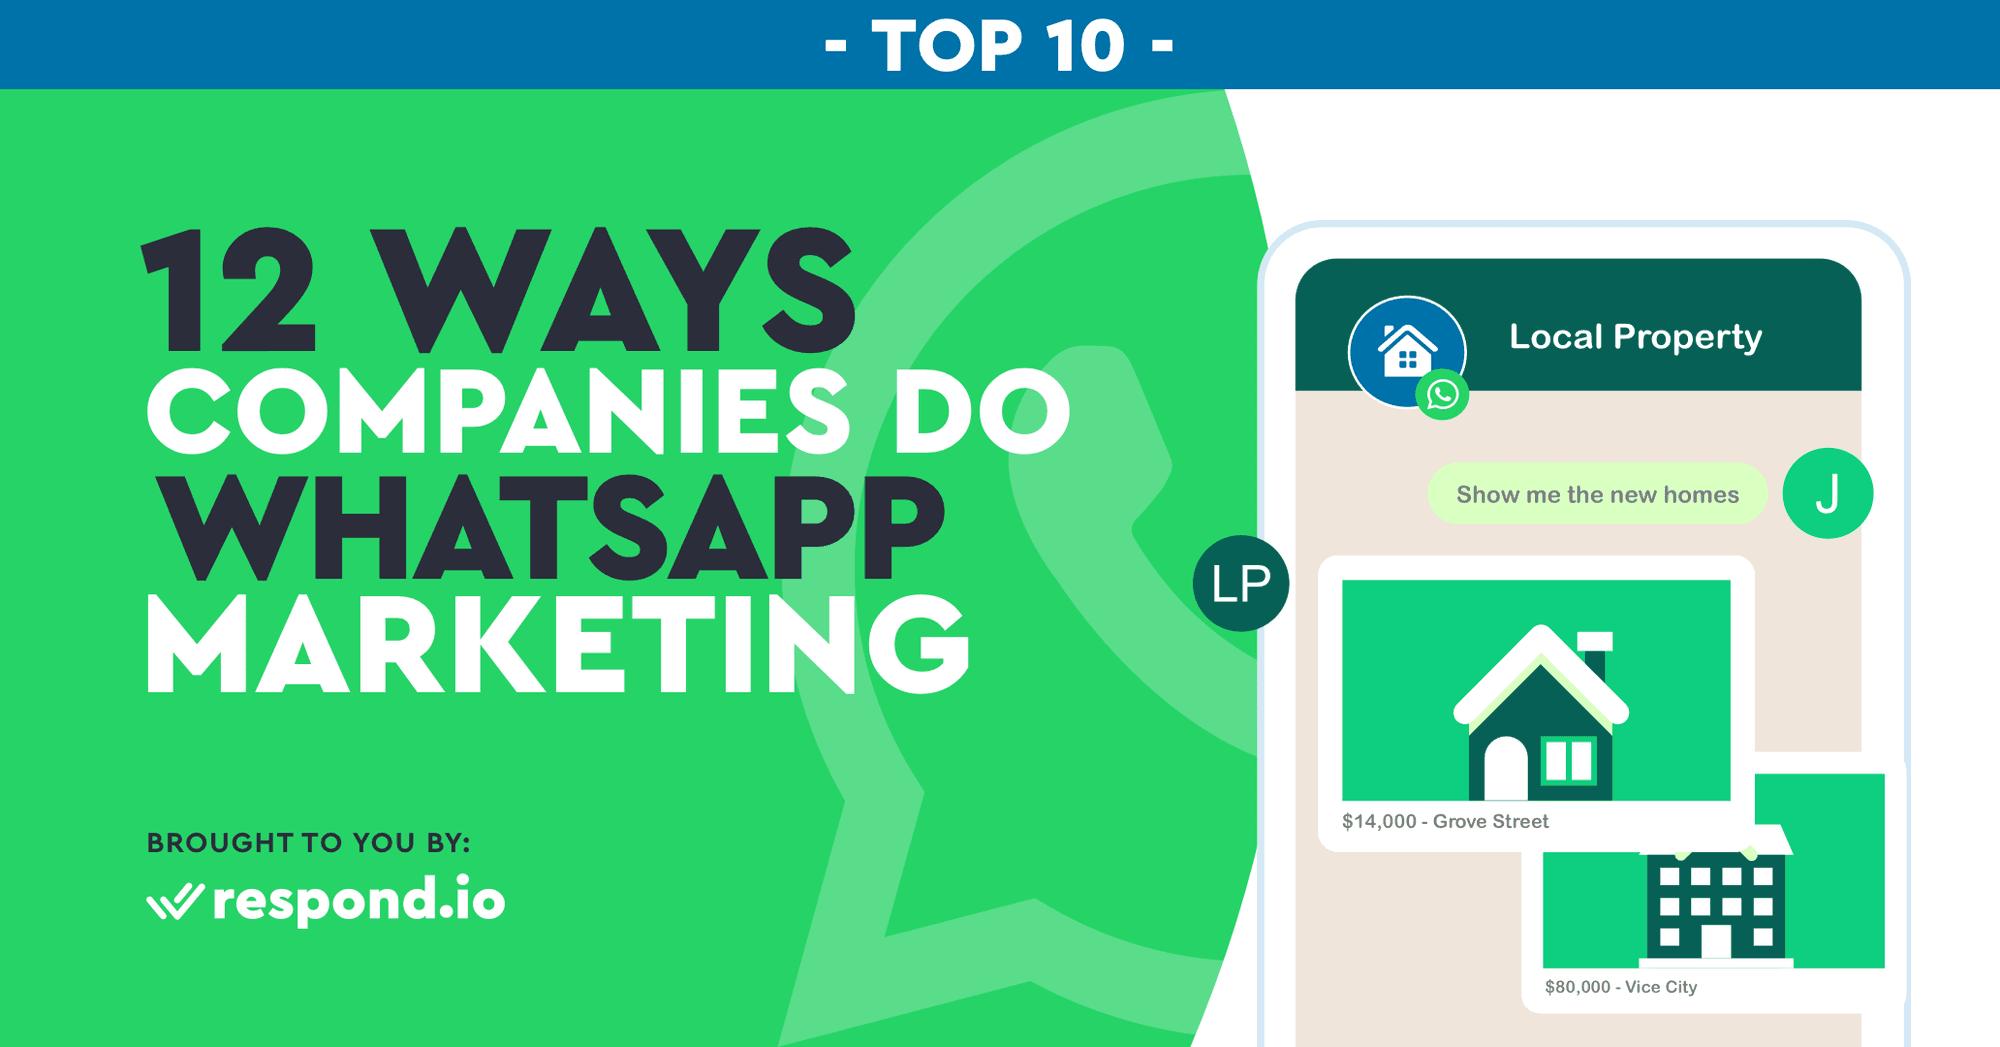 12 Ways Companies Do Whatsapp Marketing Campaigns (Nov 2020)